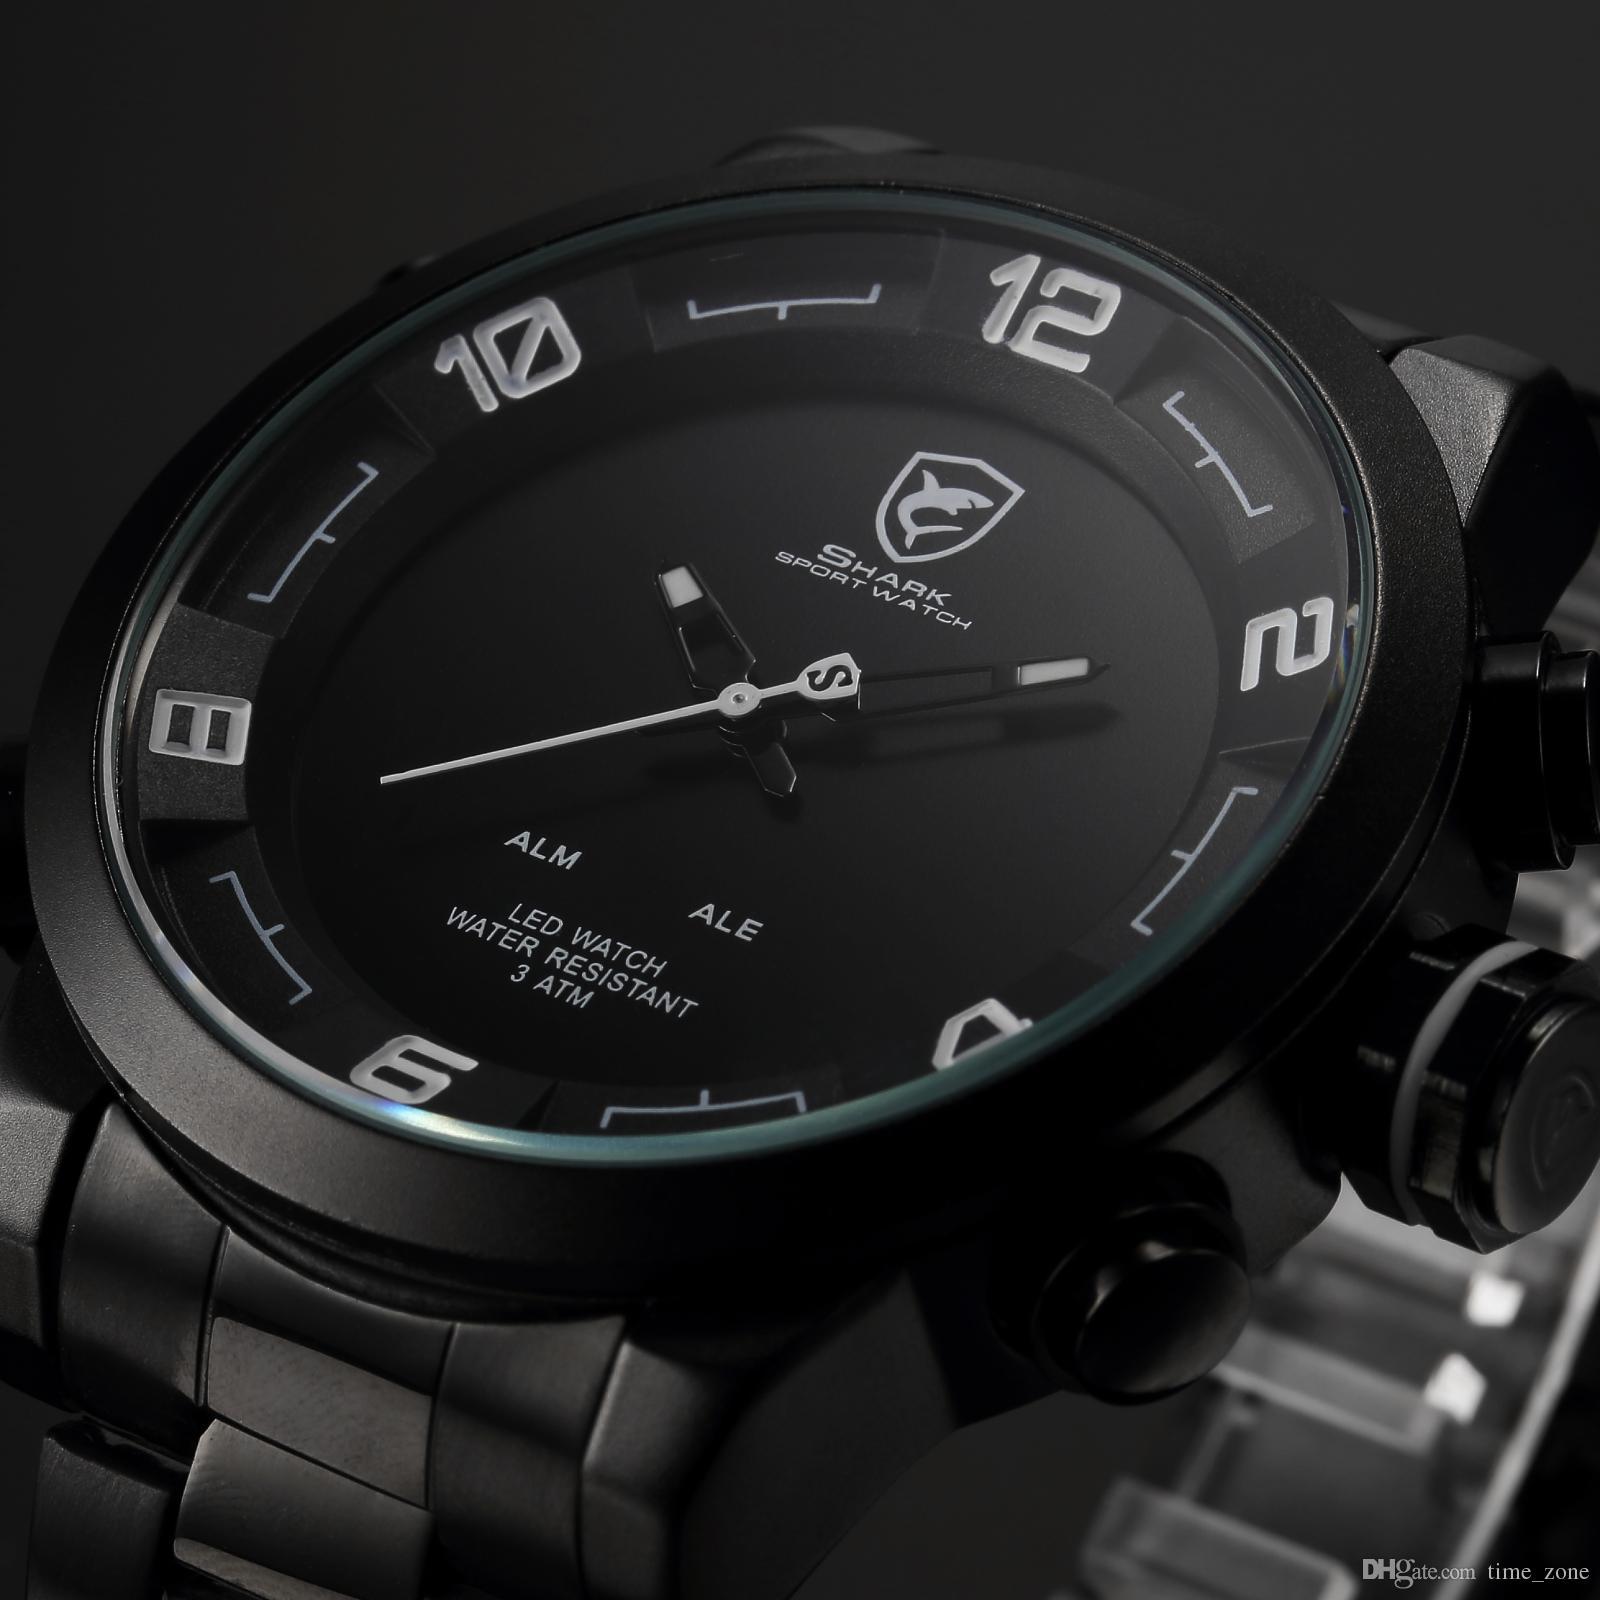 digital watches for men generation gulper shark brand digital watches men black white led dual time  date full gywyslt